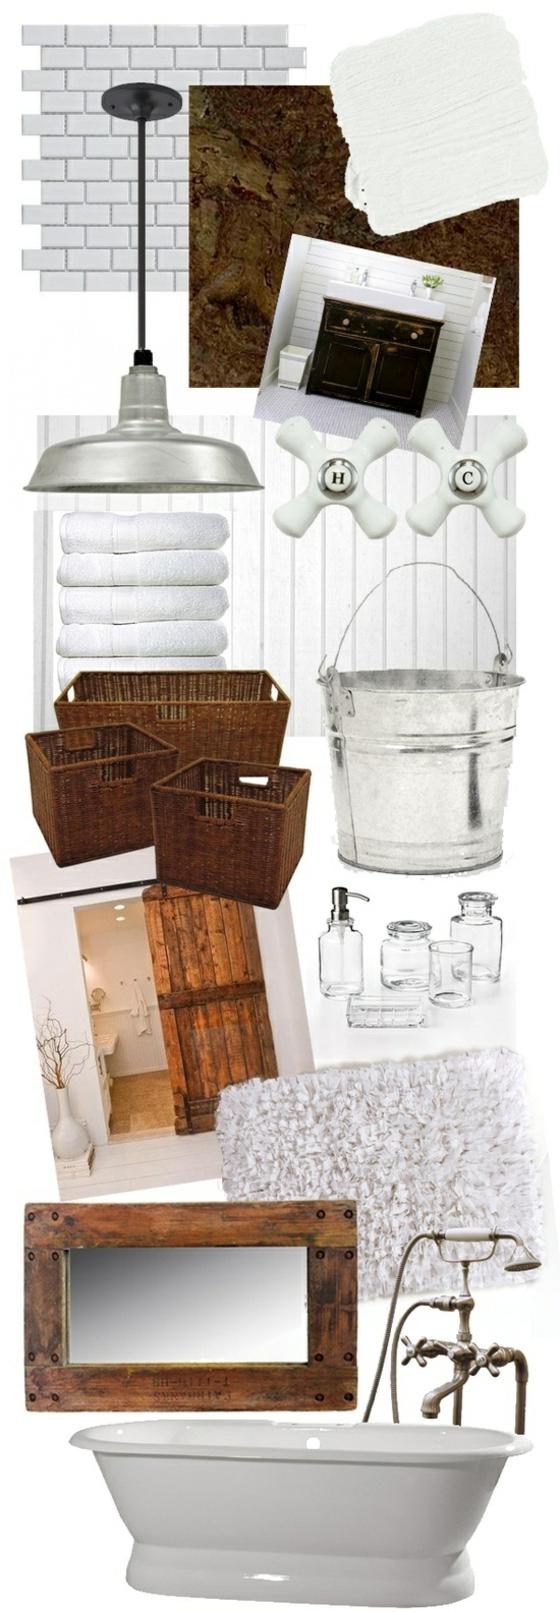 rustikale badezimmermoebel alle ideen f r ihr haus. Black Bedroom Furniture Sets. Home Design Ideas